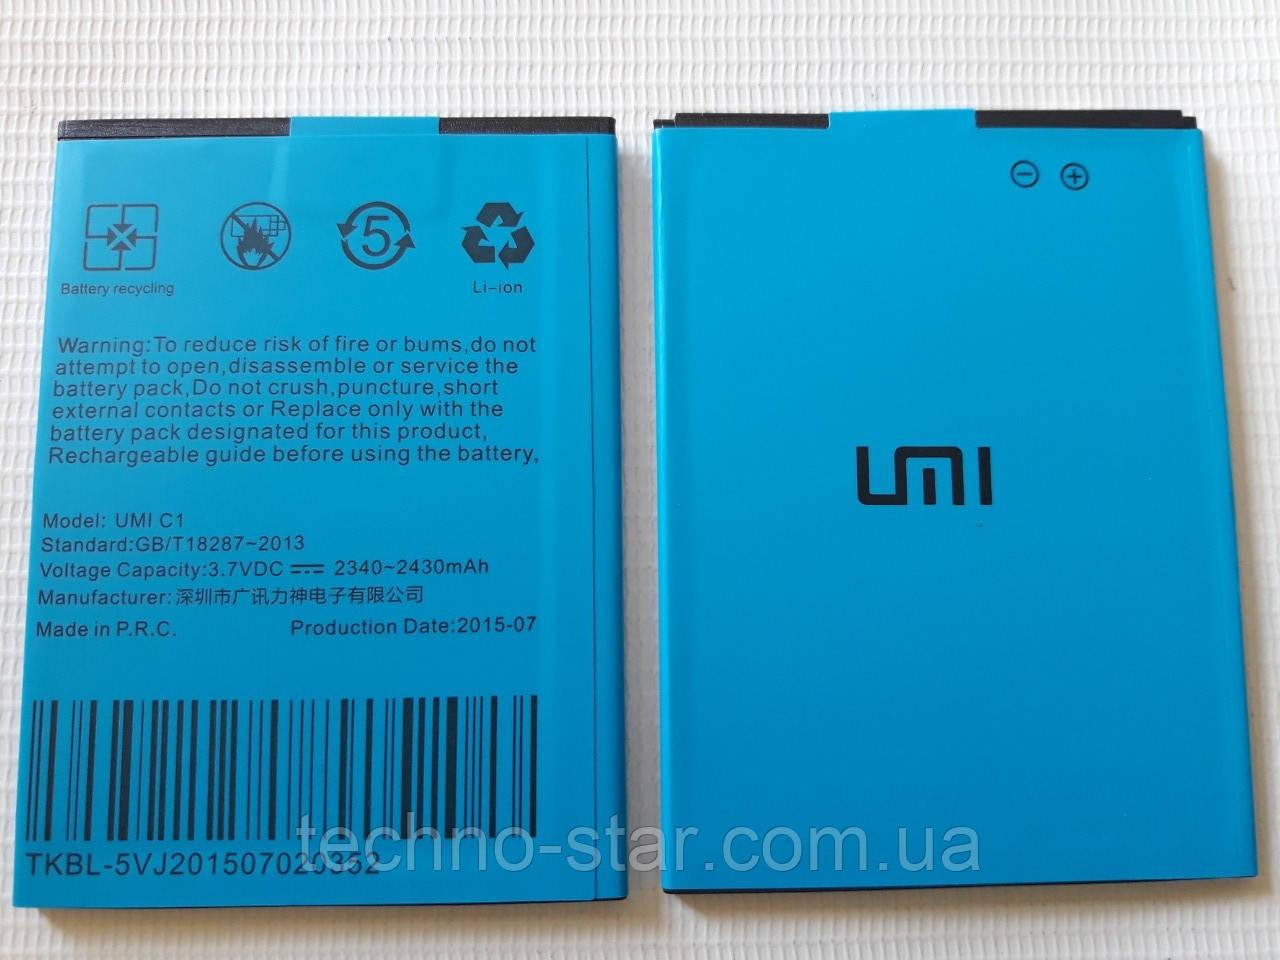 Оригинальный аккумулятор ( АКБ / батарея ) для UMi Cross C1 2340~2430mAh